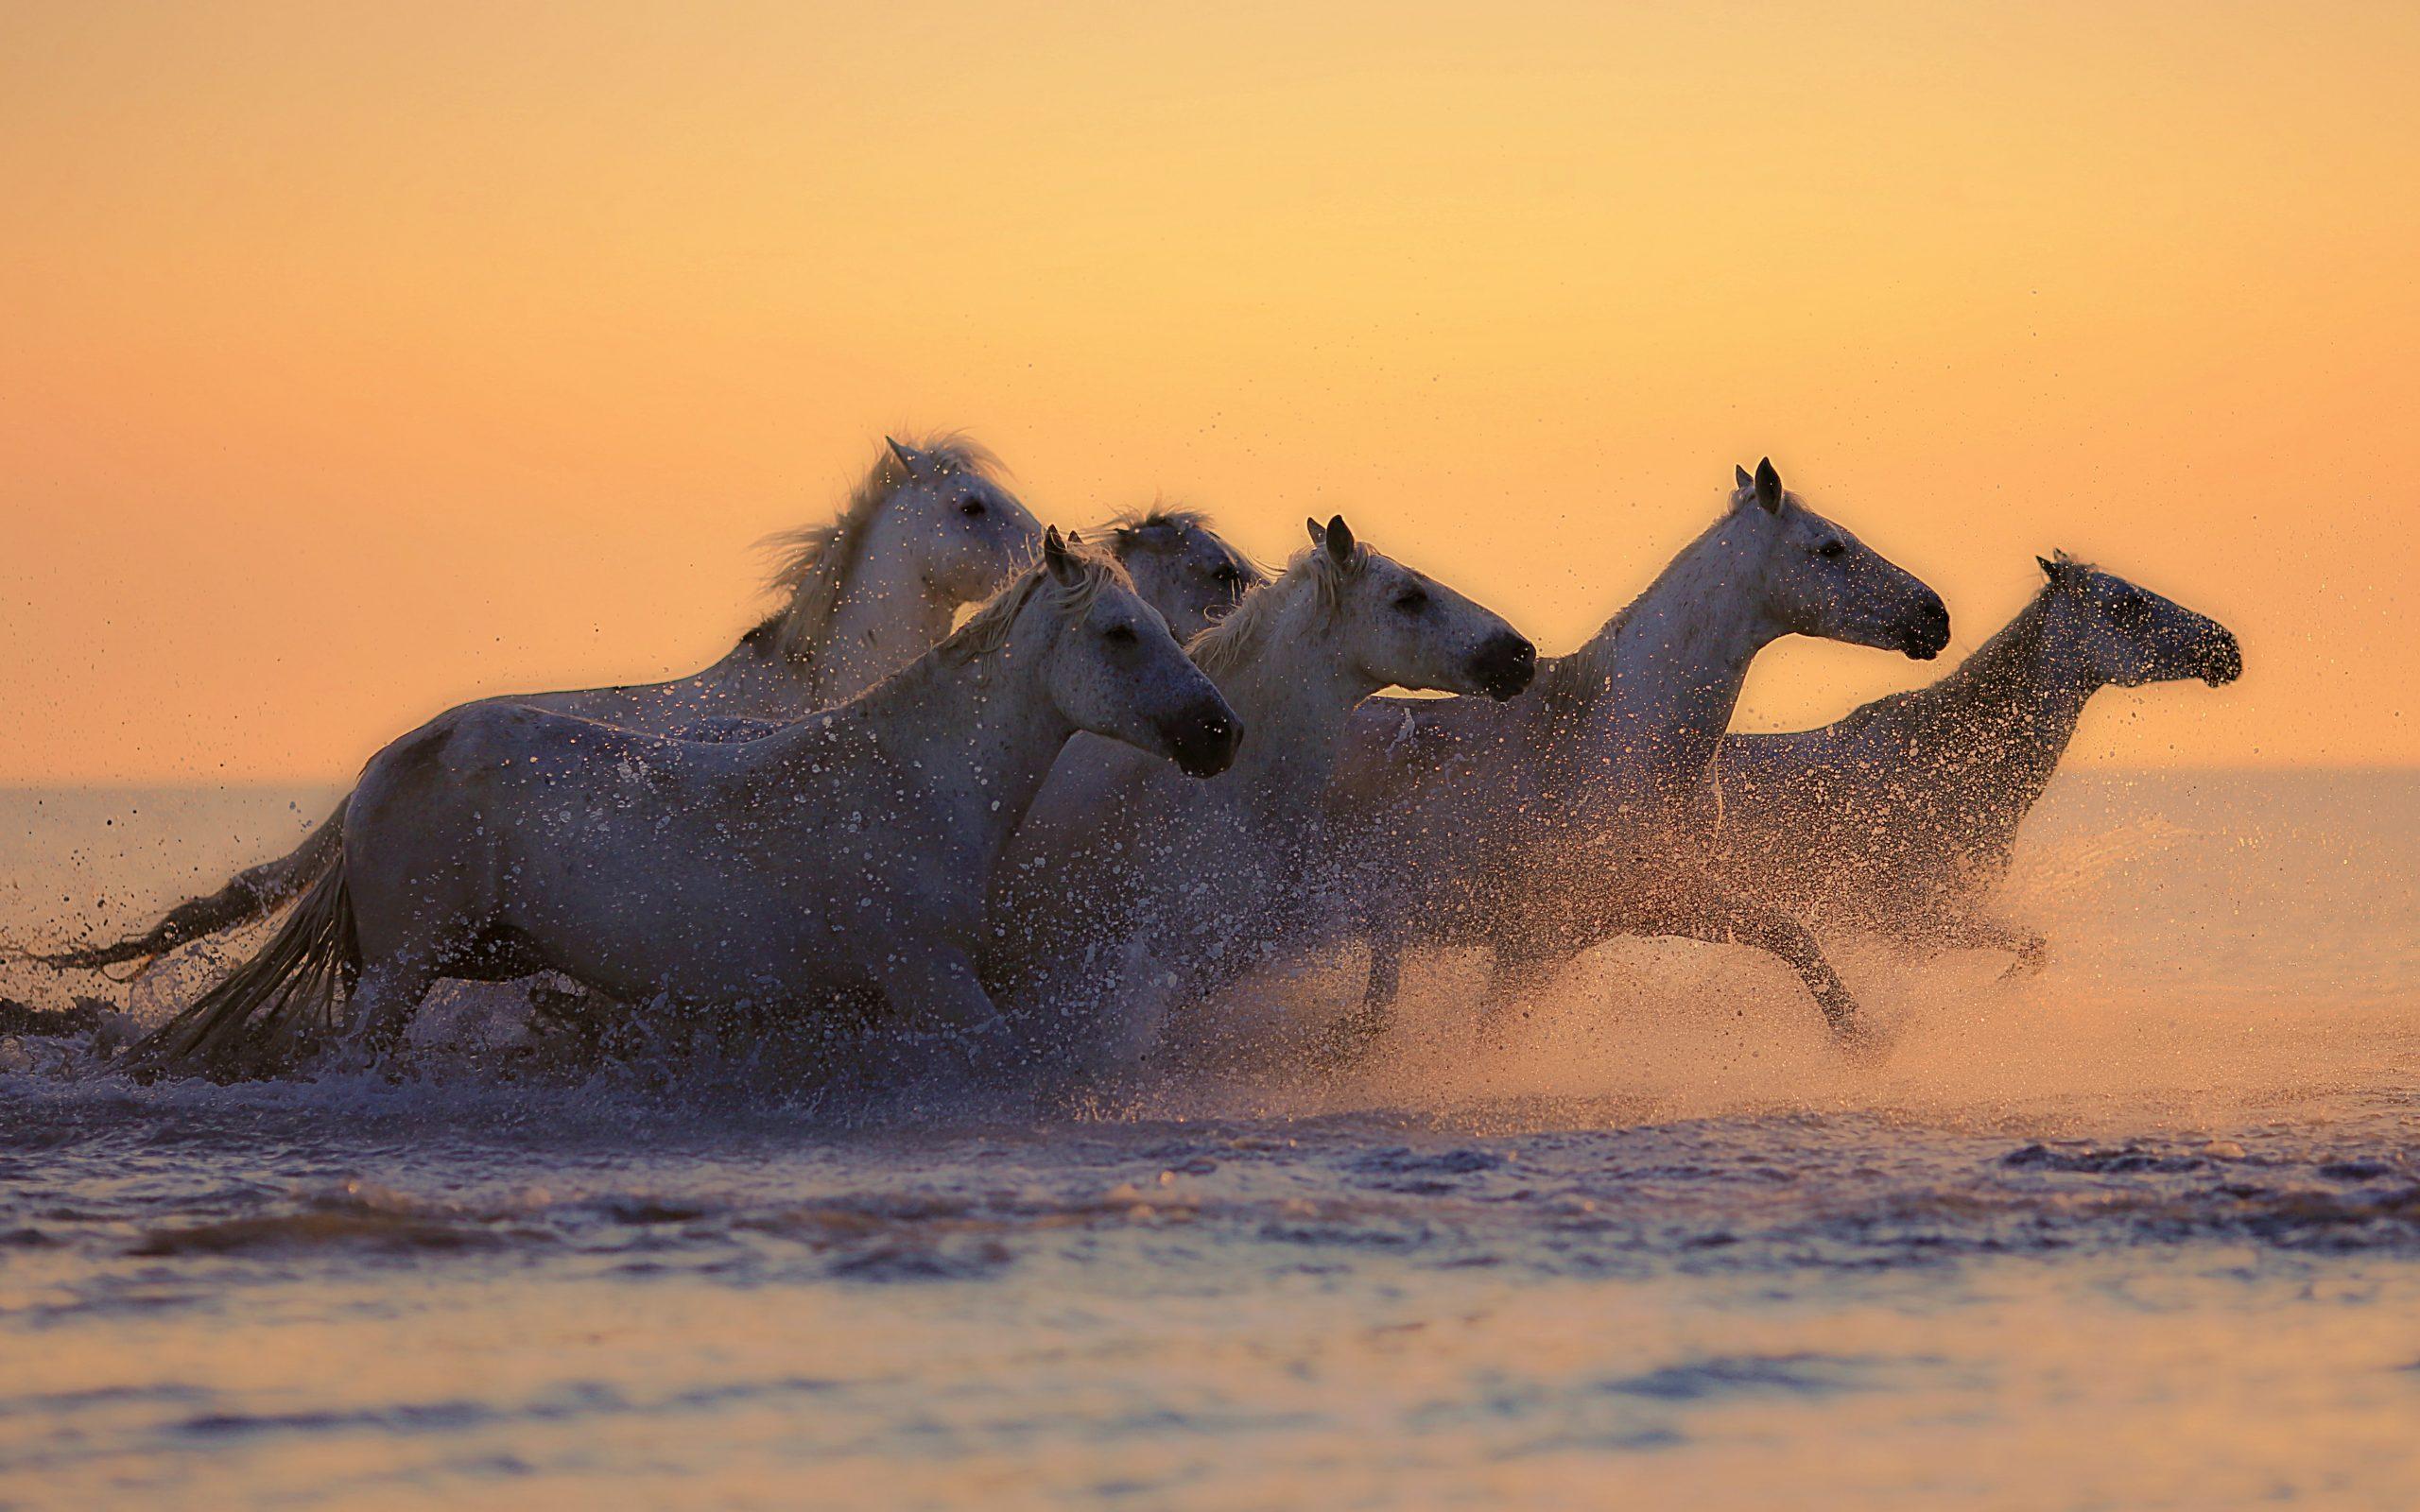 Cute Anime Wallpaper Hd Free Download White Horses Galloping At Sunset 4k Uhd Wallpaper